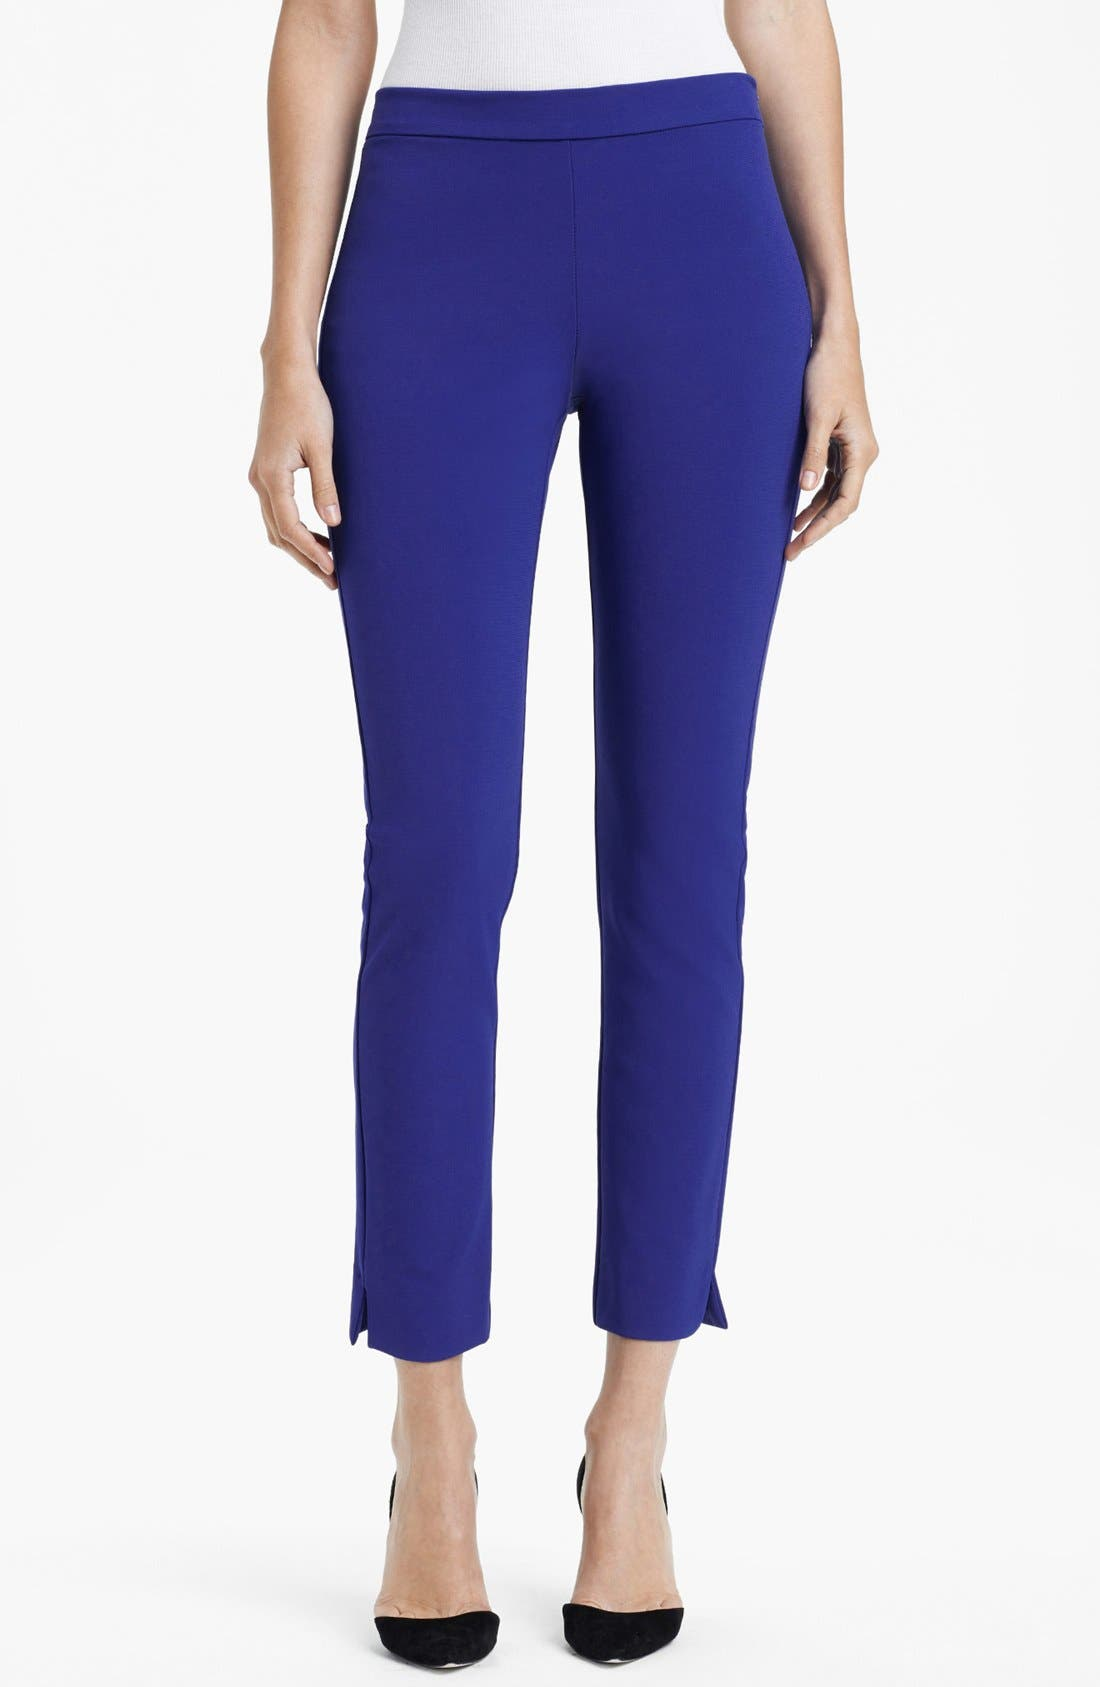 Alternate Image 1 Selected - Max Mara 'Nave' Jersey Pants